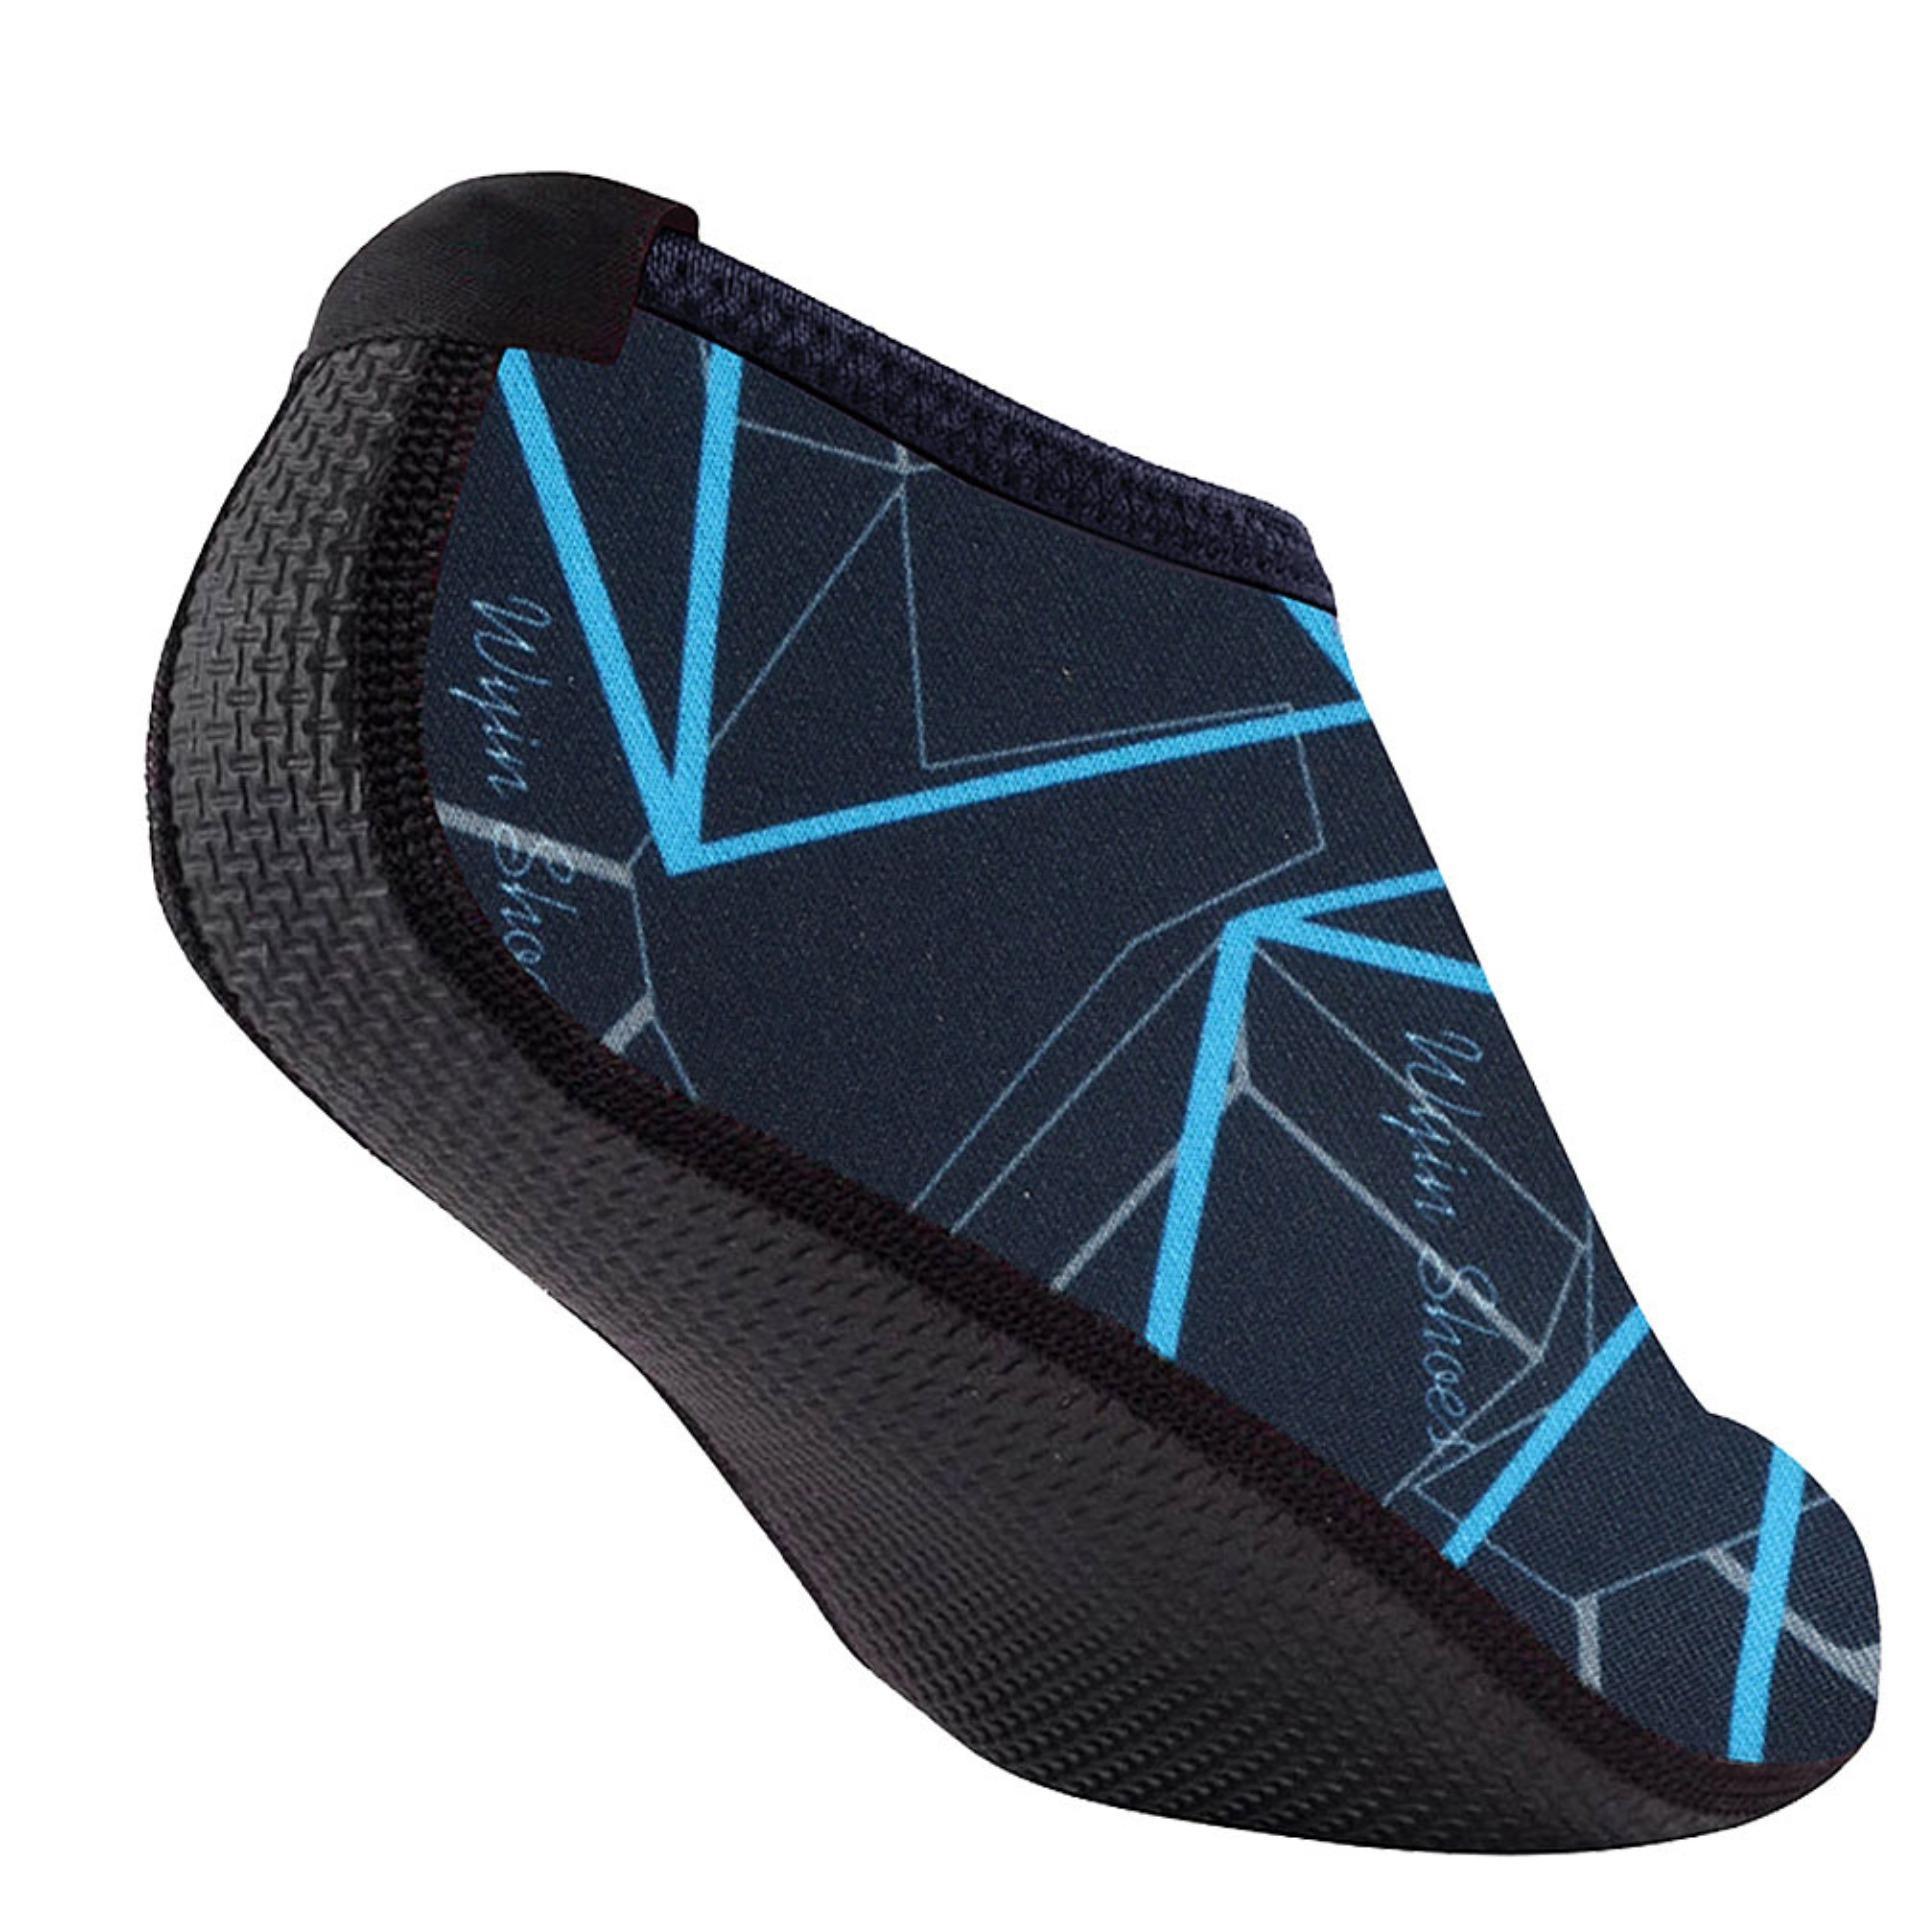 d91ac1a27b3c Orangesky Men Women Water Skin Shoes Aqua Socks Neoprene Diving Socks  Wetsuit Prevent Scratch Non-